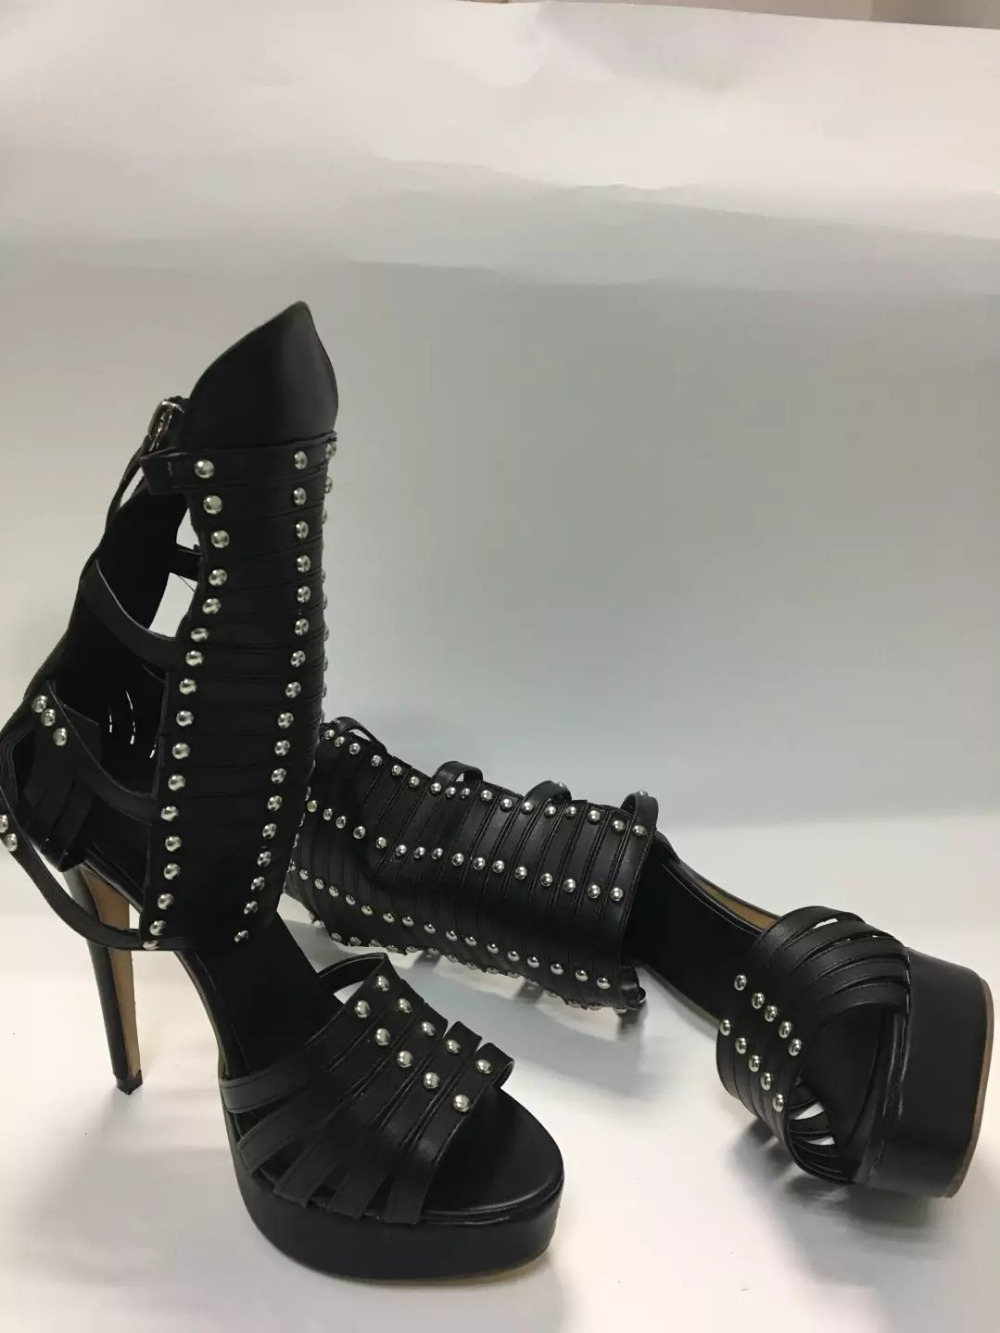 real picture 2017 summer women shoes black platform high heels sandals women rivet gladiator sandal boots zipper ladies shoes real photo black and nude patent leather women sandals stilettos high heels no ps ol ladies sandal shoes new 2016 sandal shoes